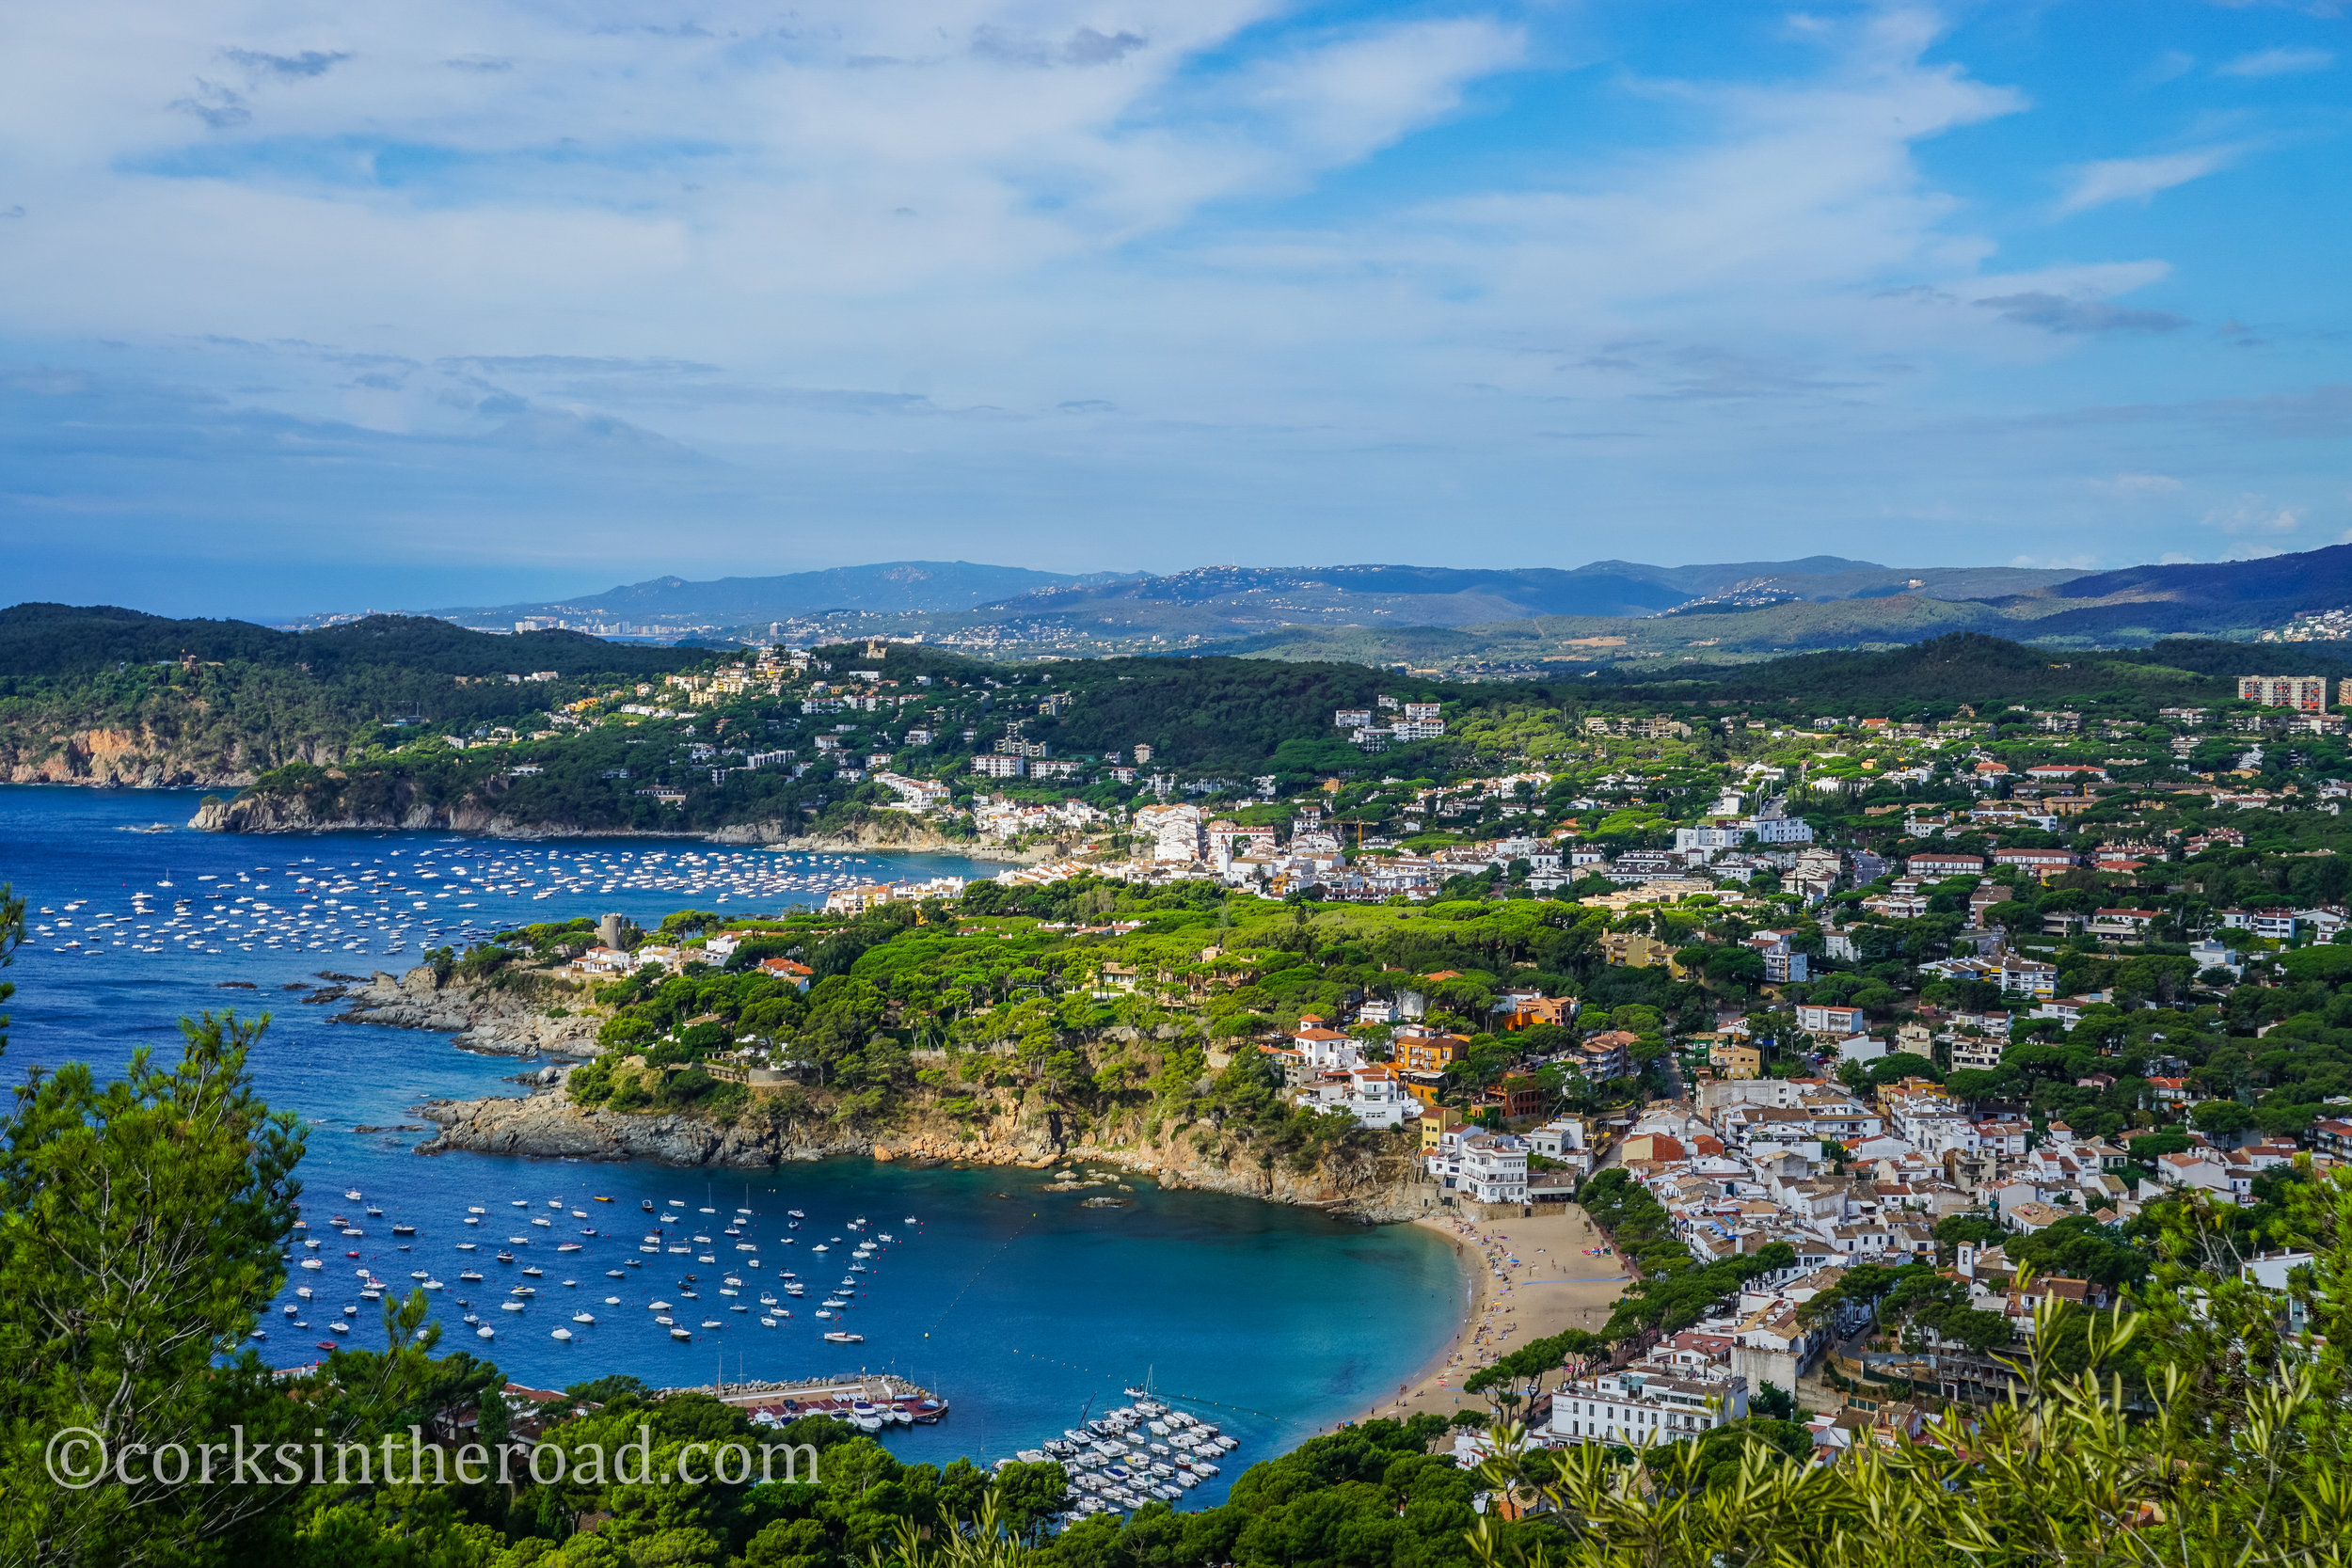 20160810Barcelona, Corksintheroad, Costa Brava, Costa Brava Landscape-2.jpg